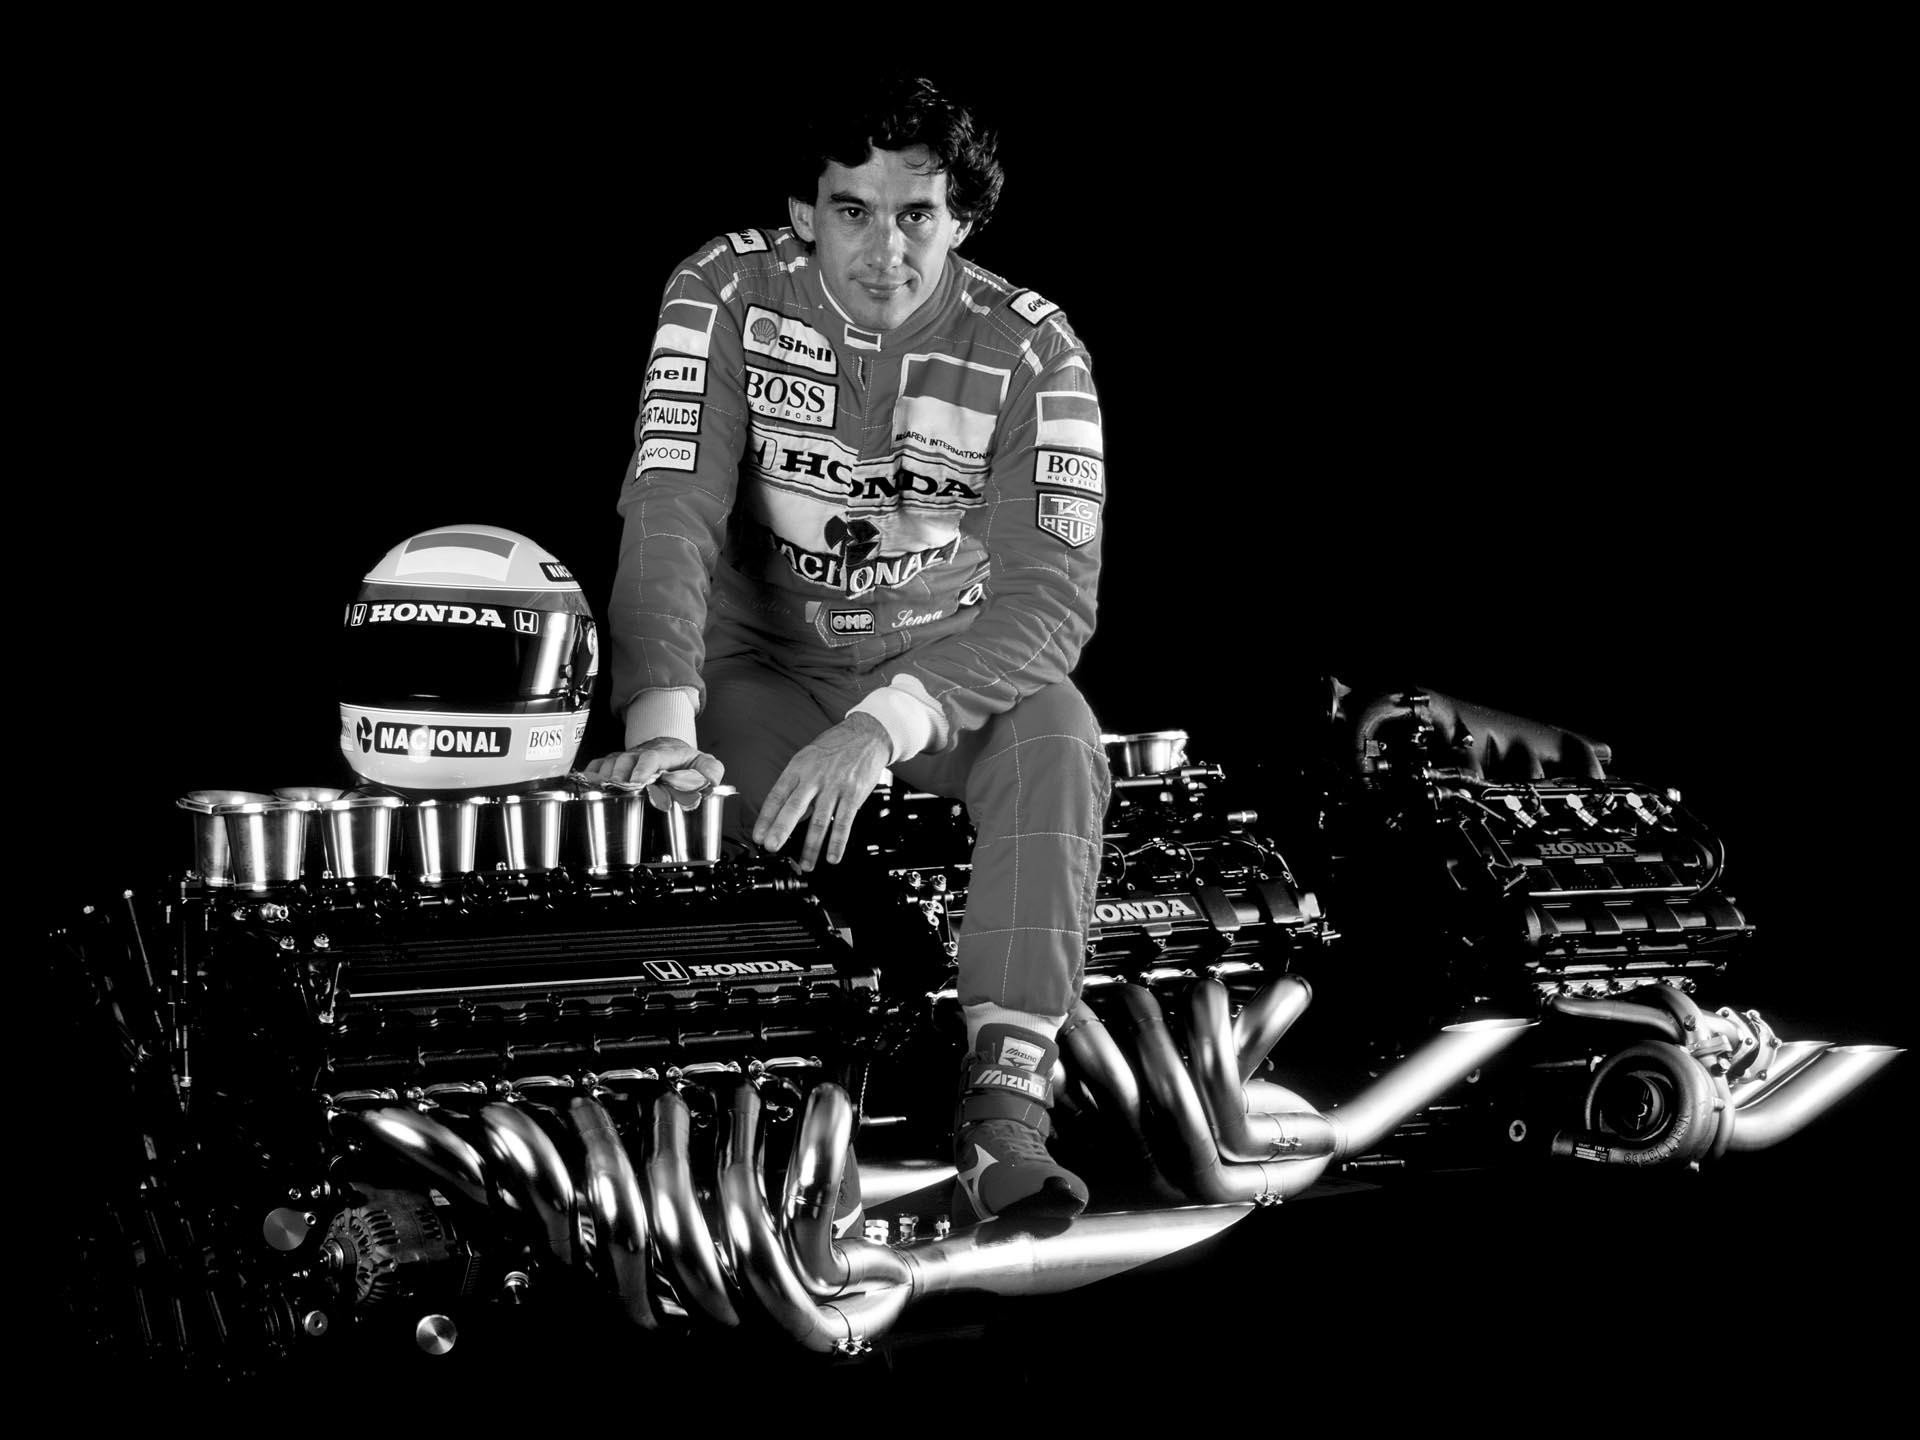 Hd Wallpapers 1080p Widescreen Quotes Ayrton Senna Desktop Background Pixelstalk Net